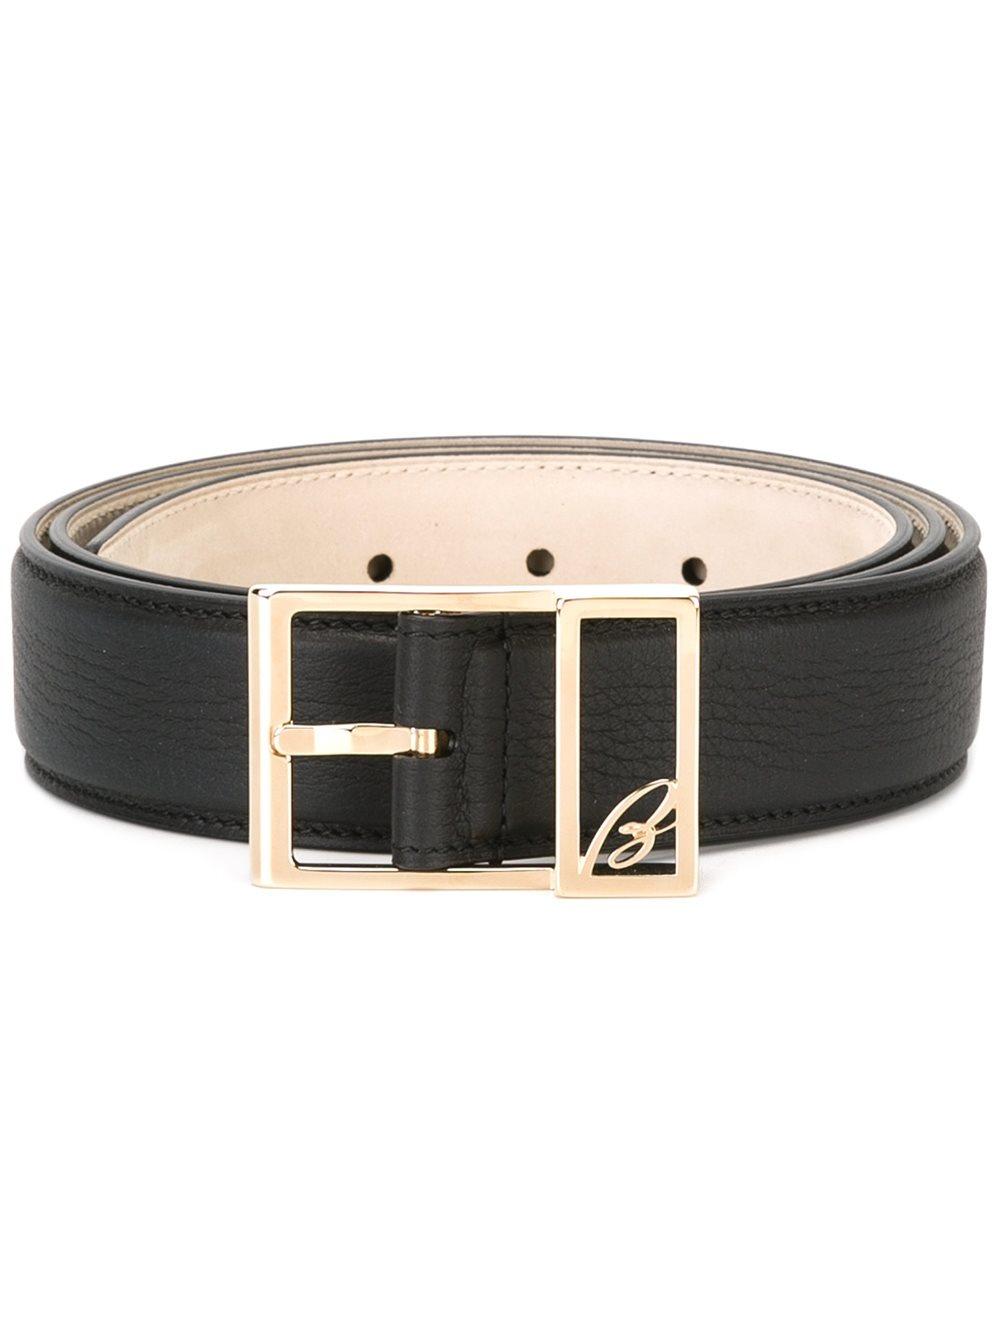 5d0937086e597 Brioni Wide Belt in Black for Men - Lyst